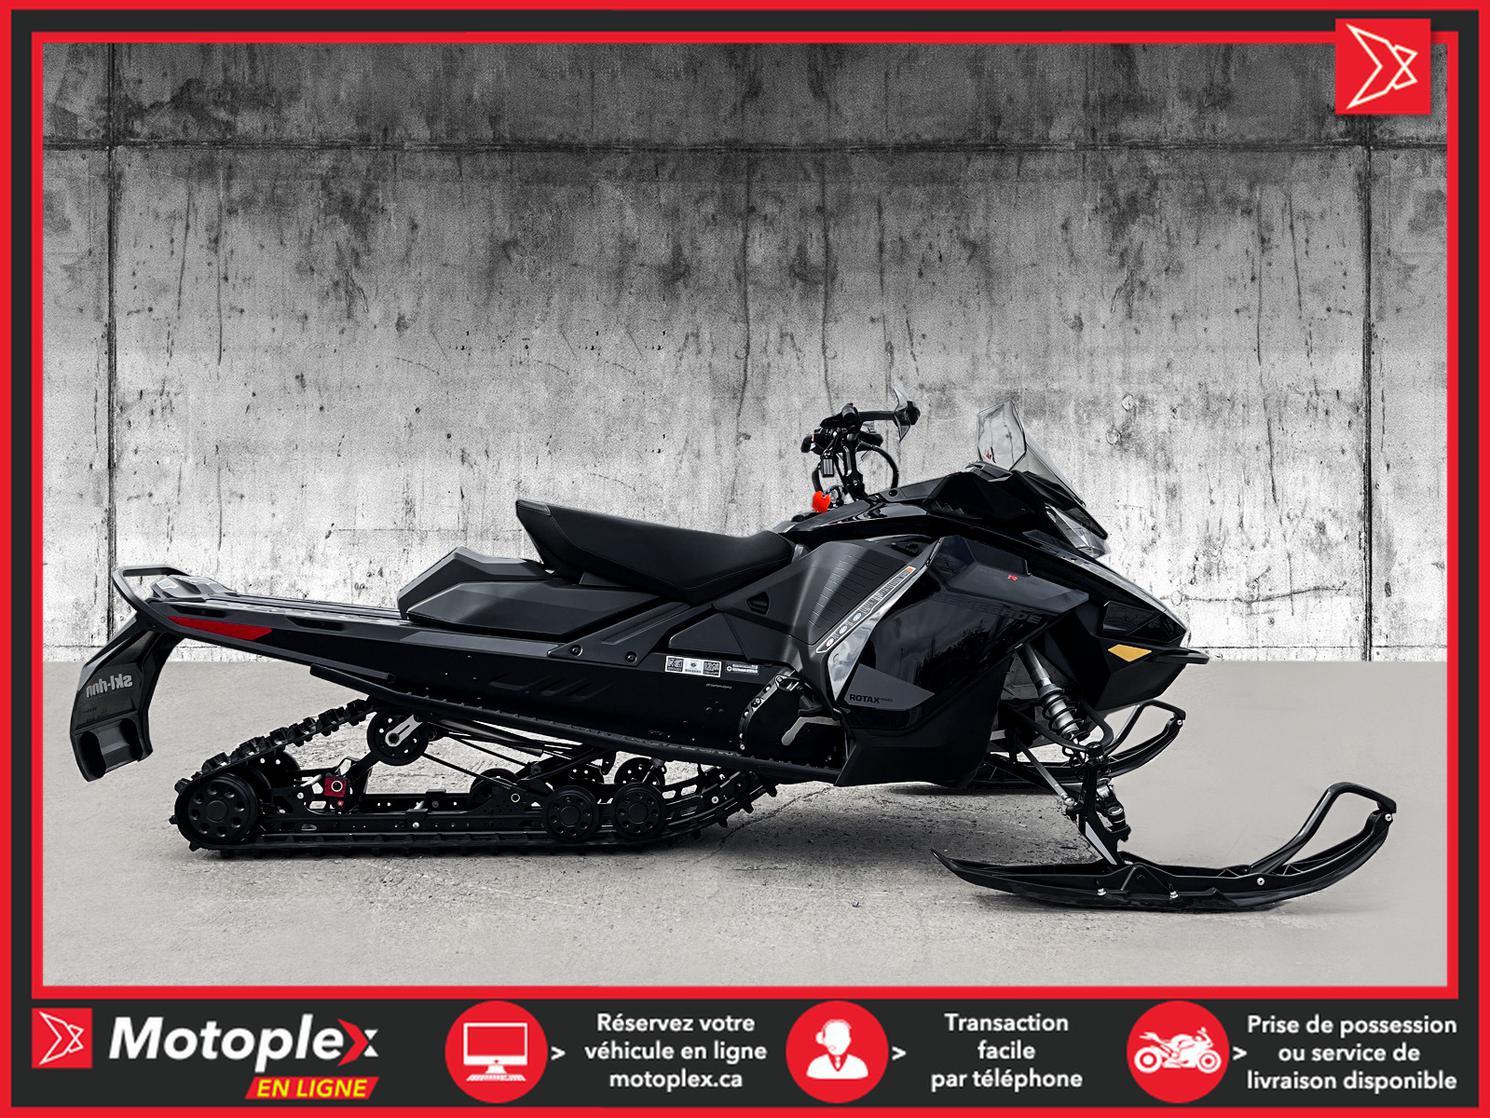 2021 Ski-Doo RENEGADE ADRENALINE  600 E-TEC - 37$/SEMAINE